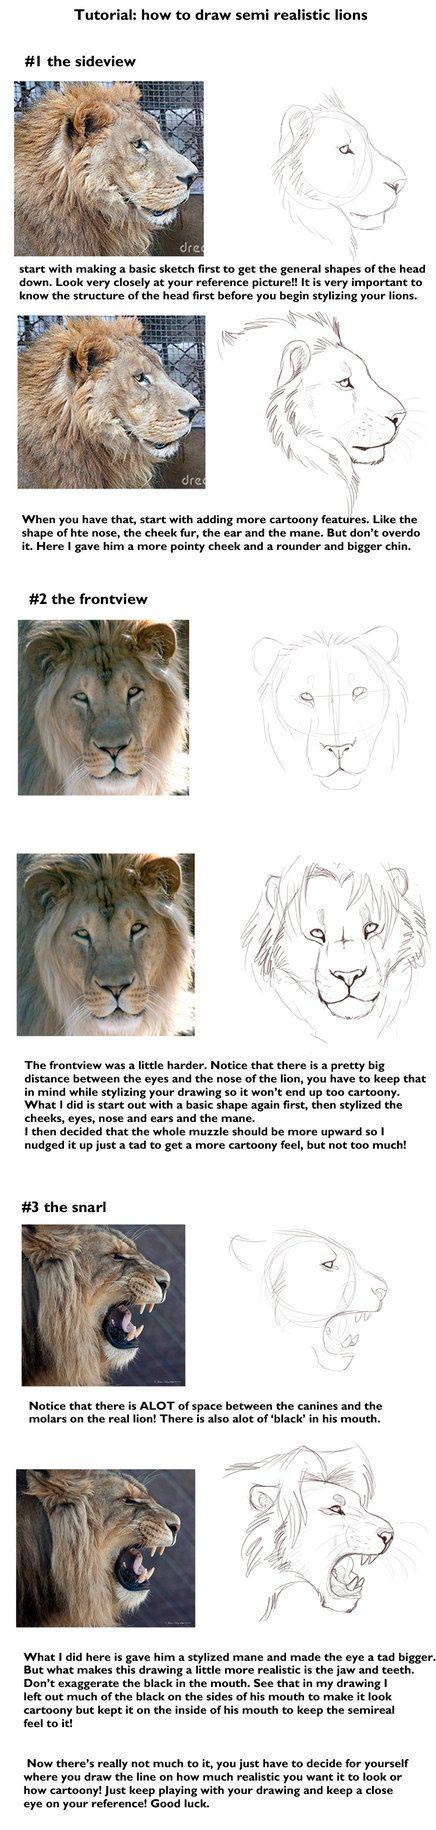 Animal Anatomy - Cats Part 1 by akeli on DeviantArt | Dibujo ...